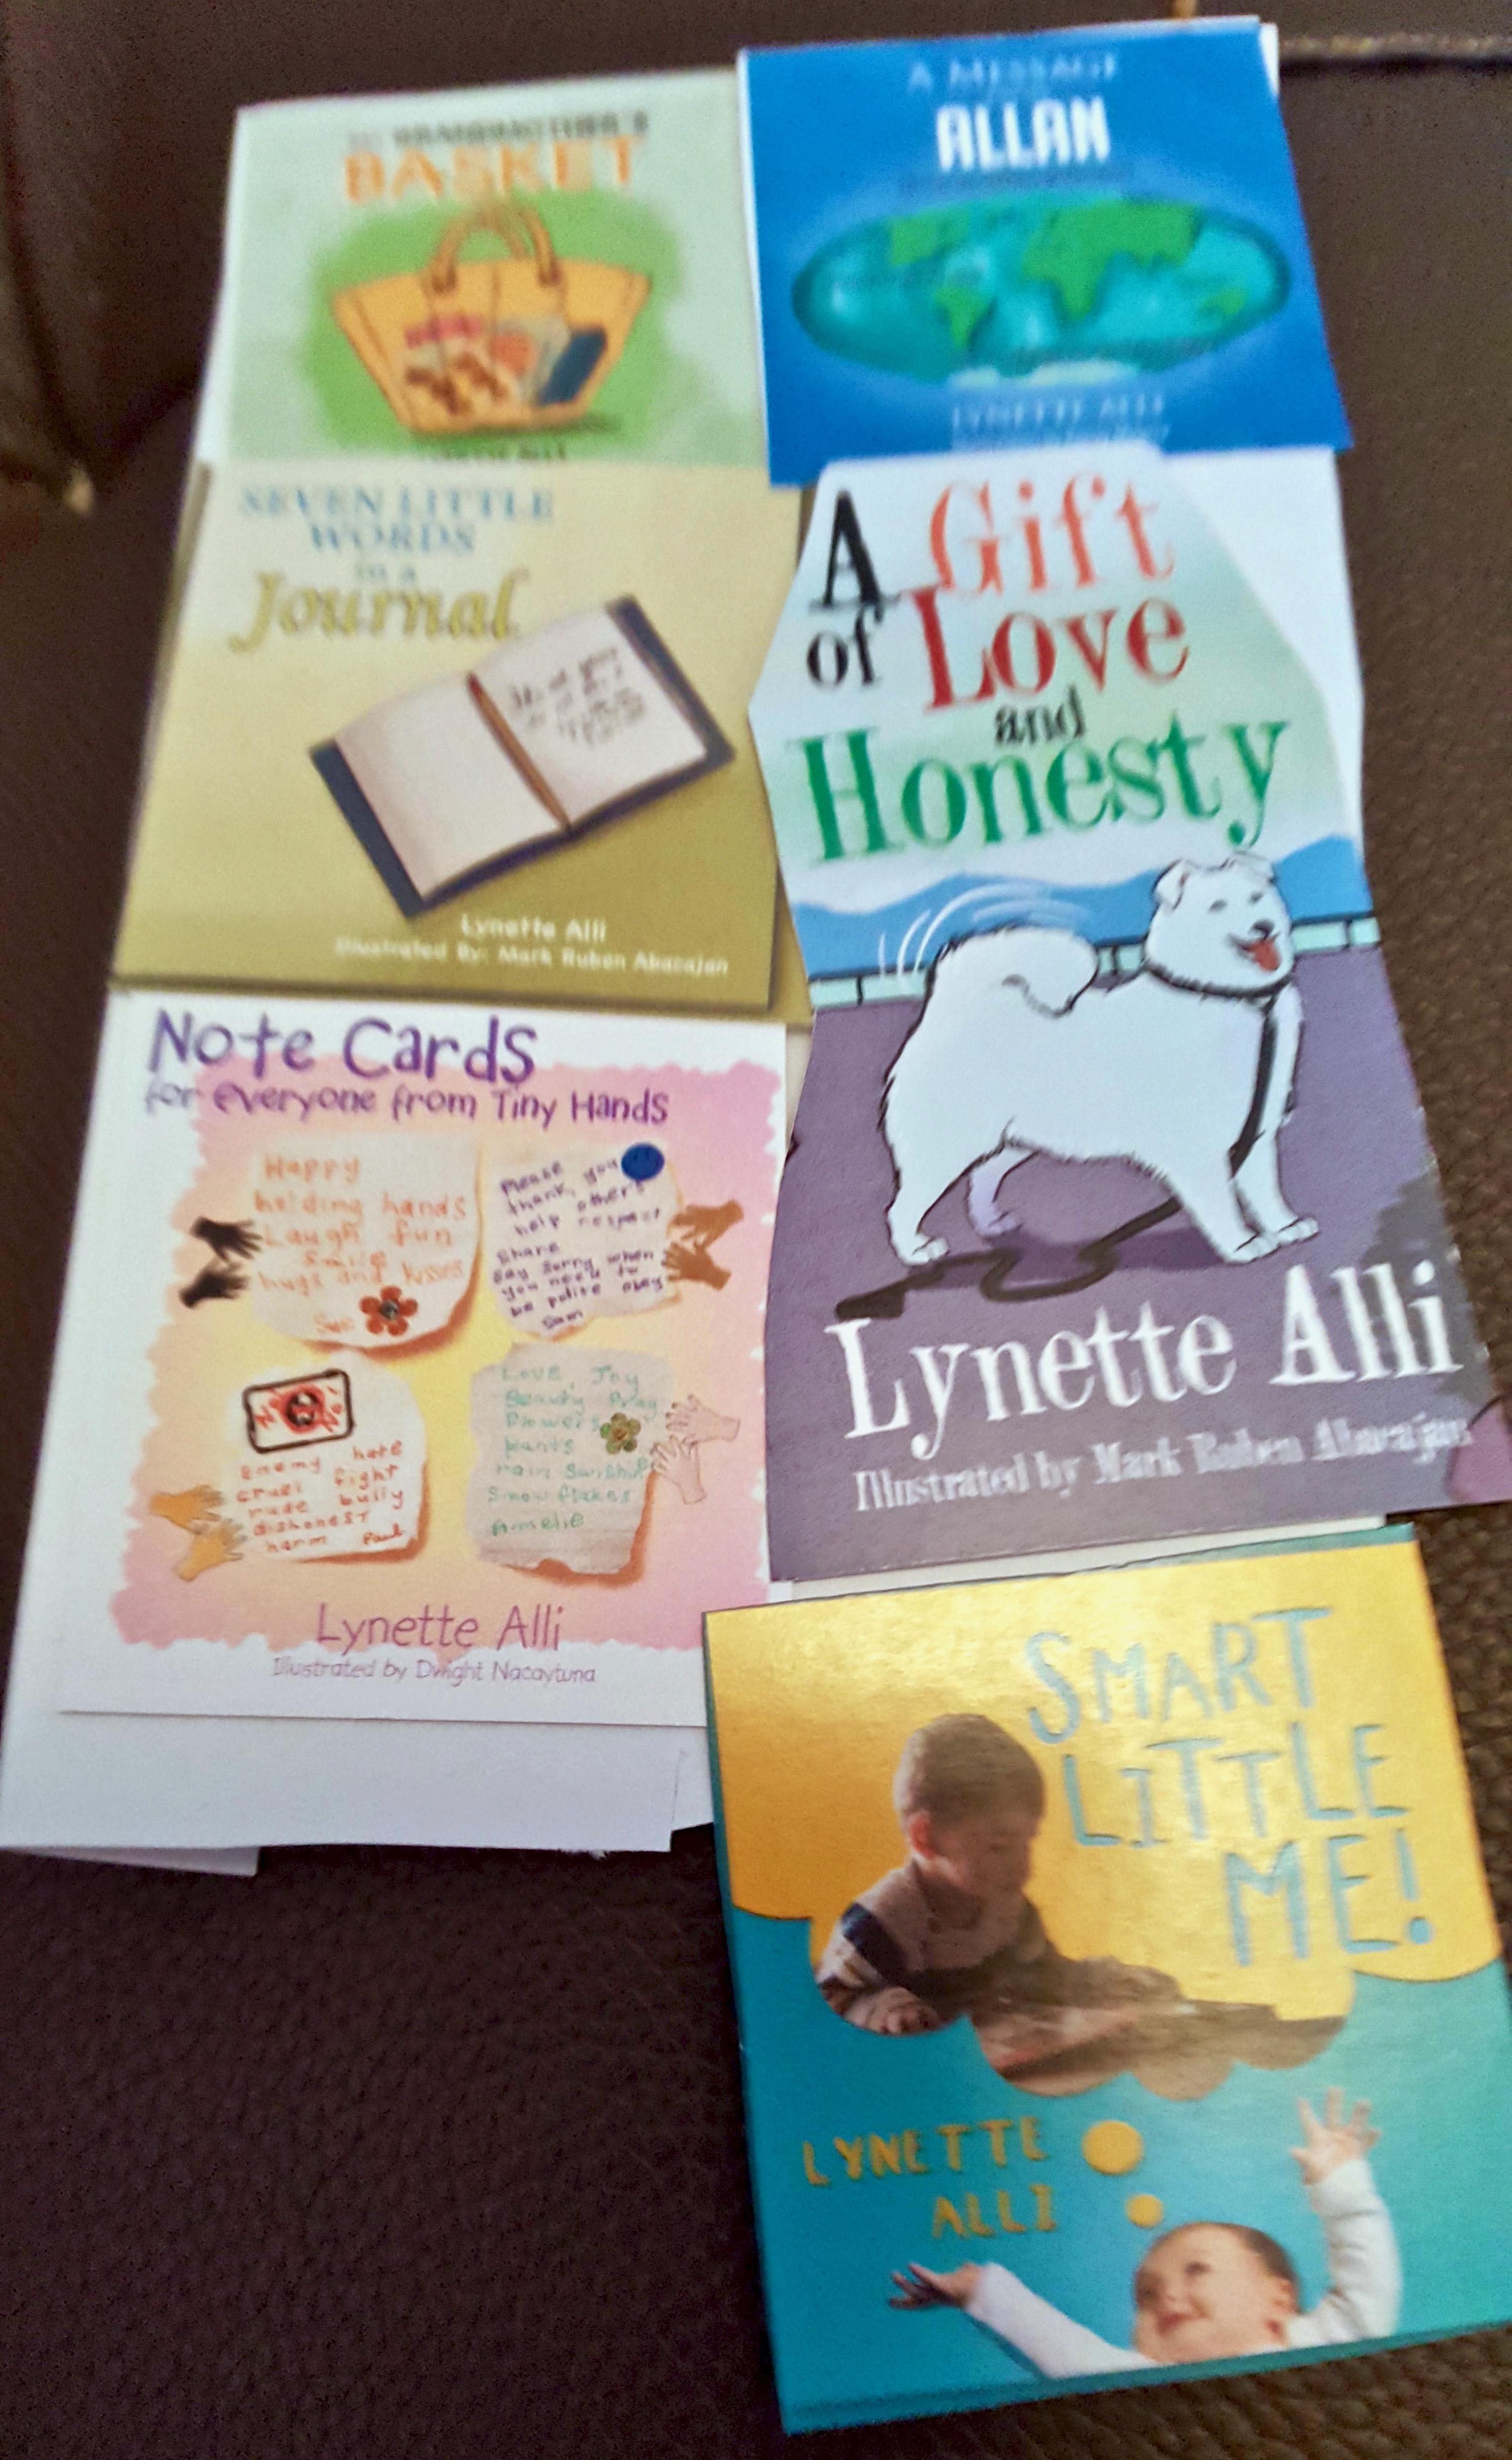 Lynette Alli Book Covers (1)